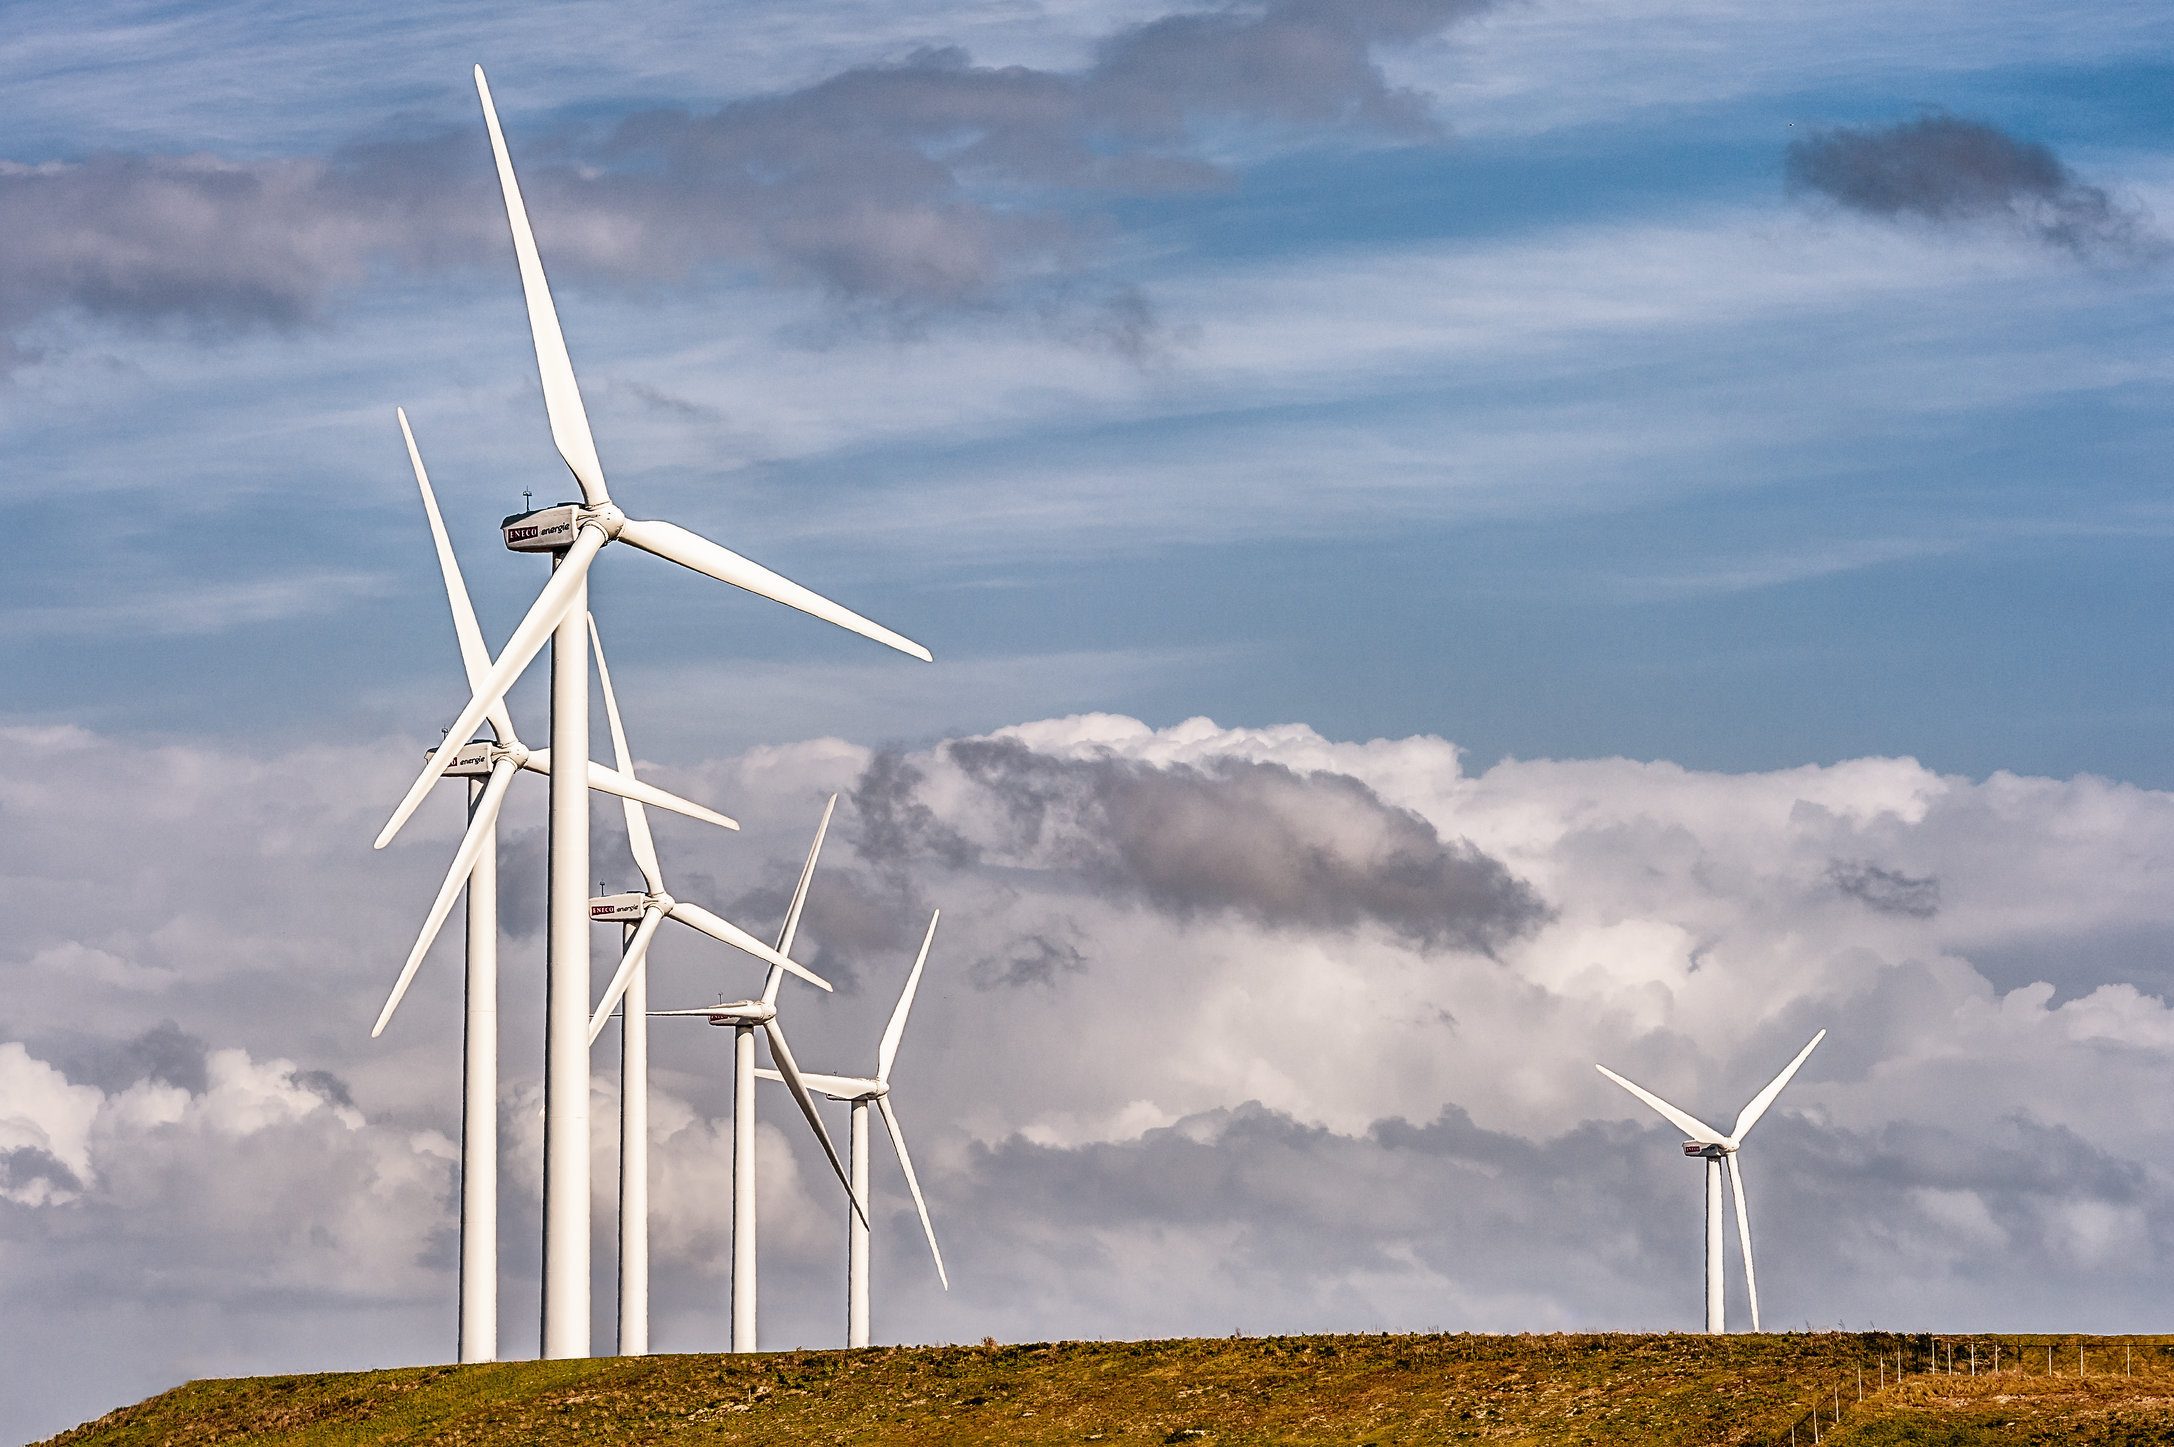 Windpark Eneco Tweede Maasvlakte